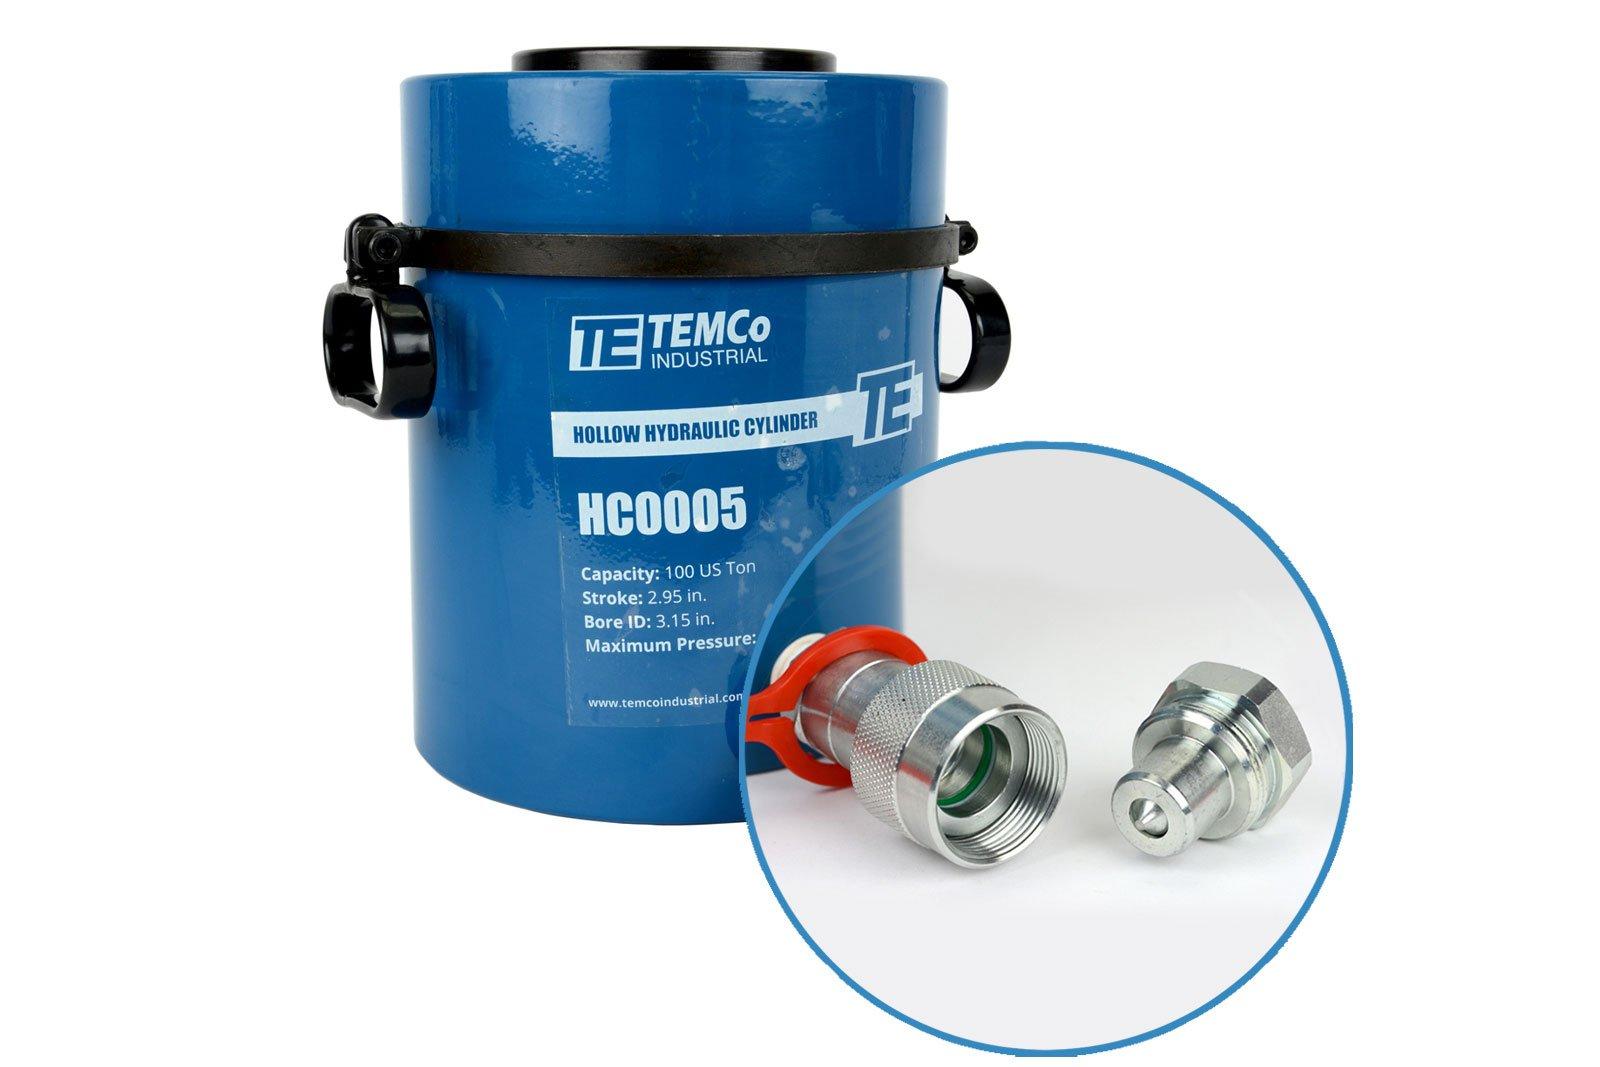 TEMCo HC0005 - Hollow Hydraulic Cylinder Ram 100 TON 3 In Stroke - 5 YEAR Warranty